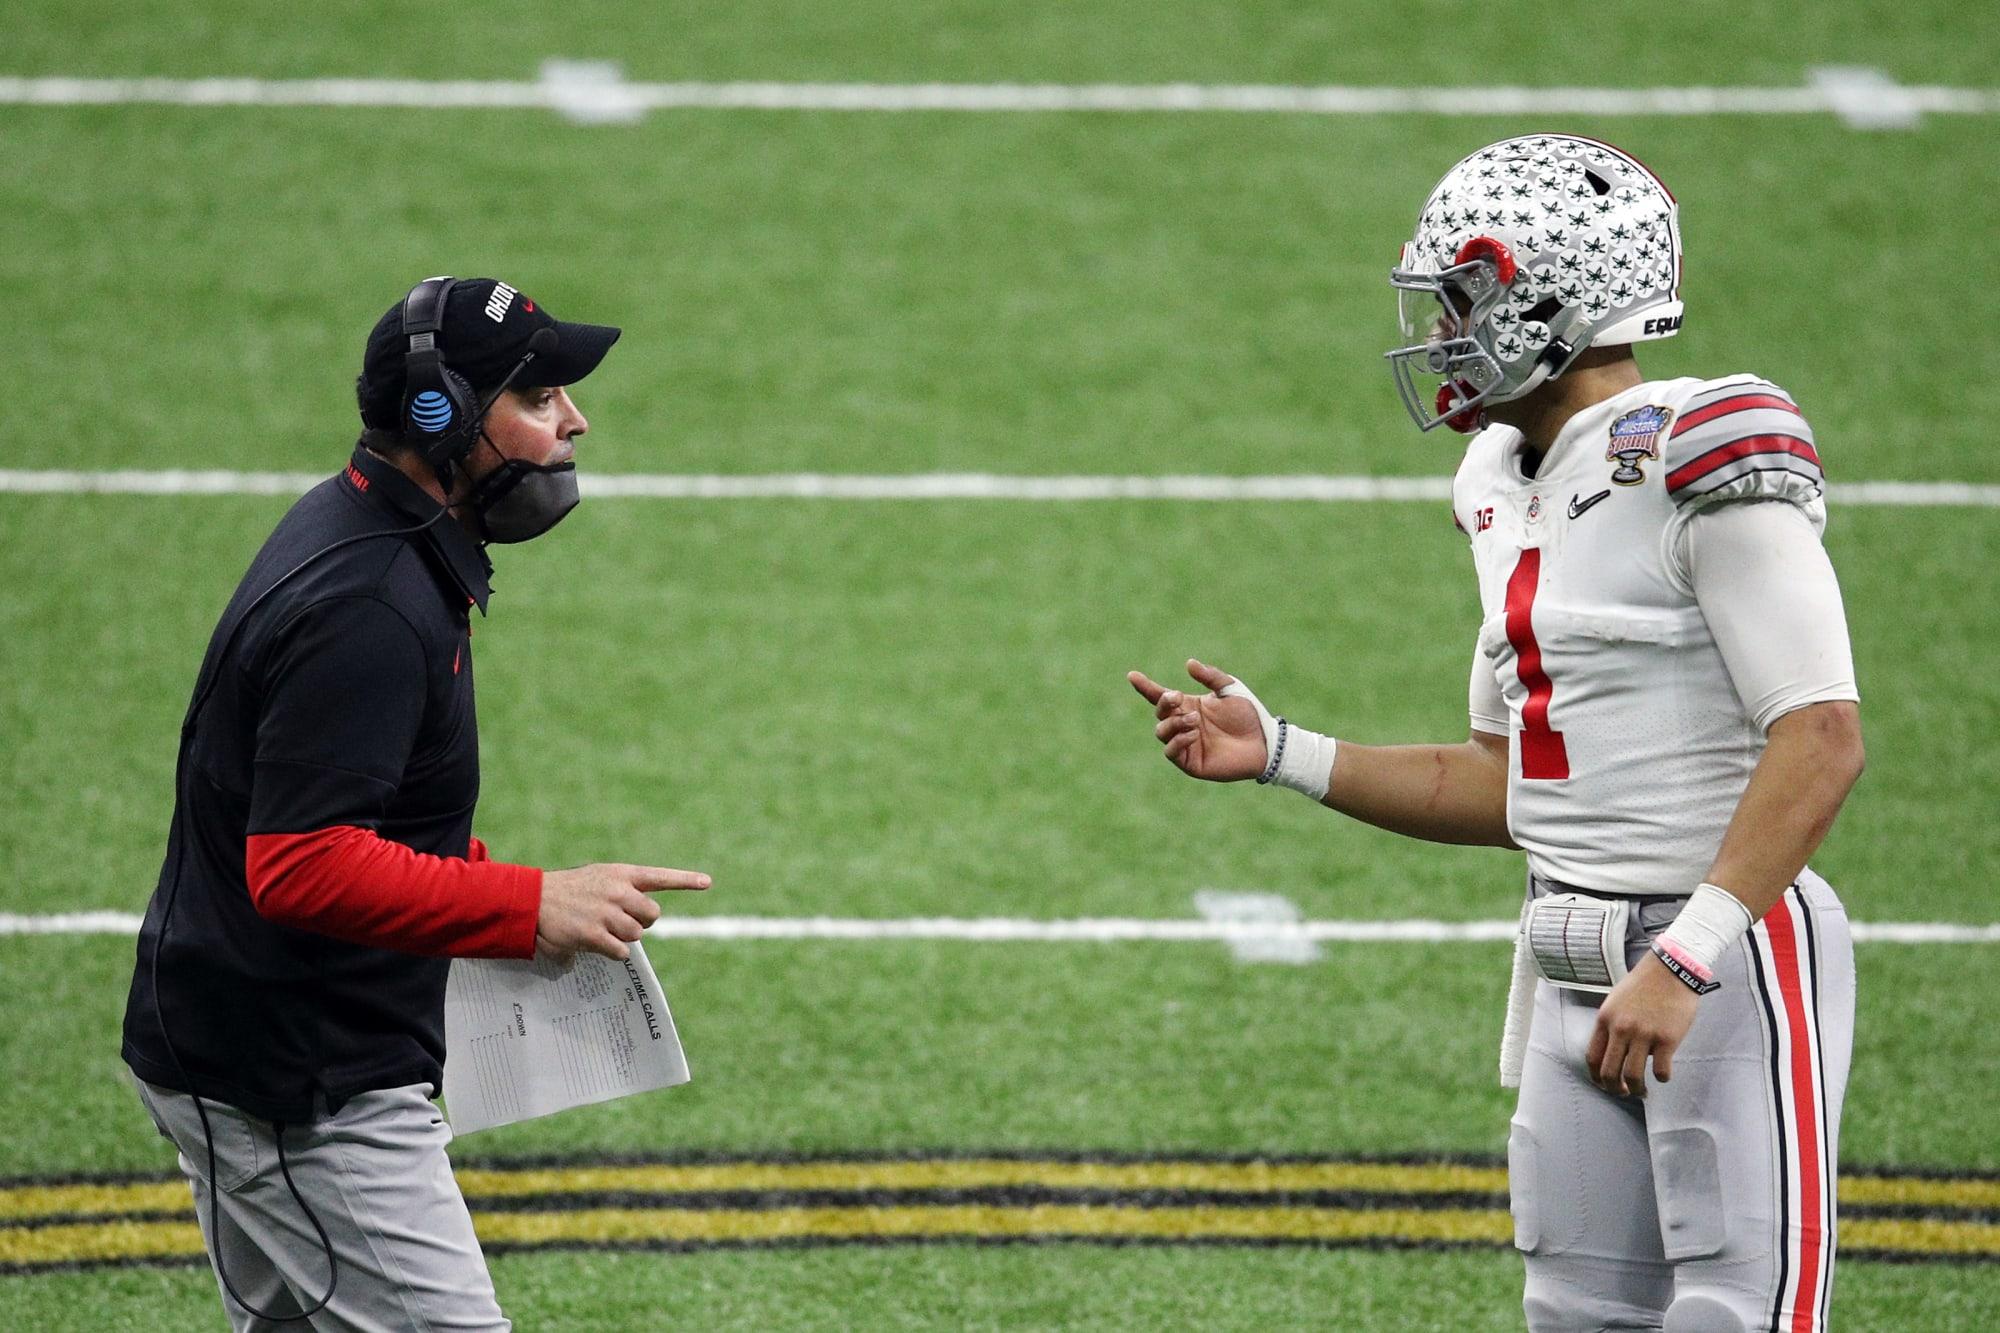 Ohio State Football: Buckeyes will score 45 points against Alabama